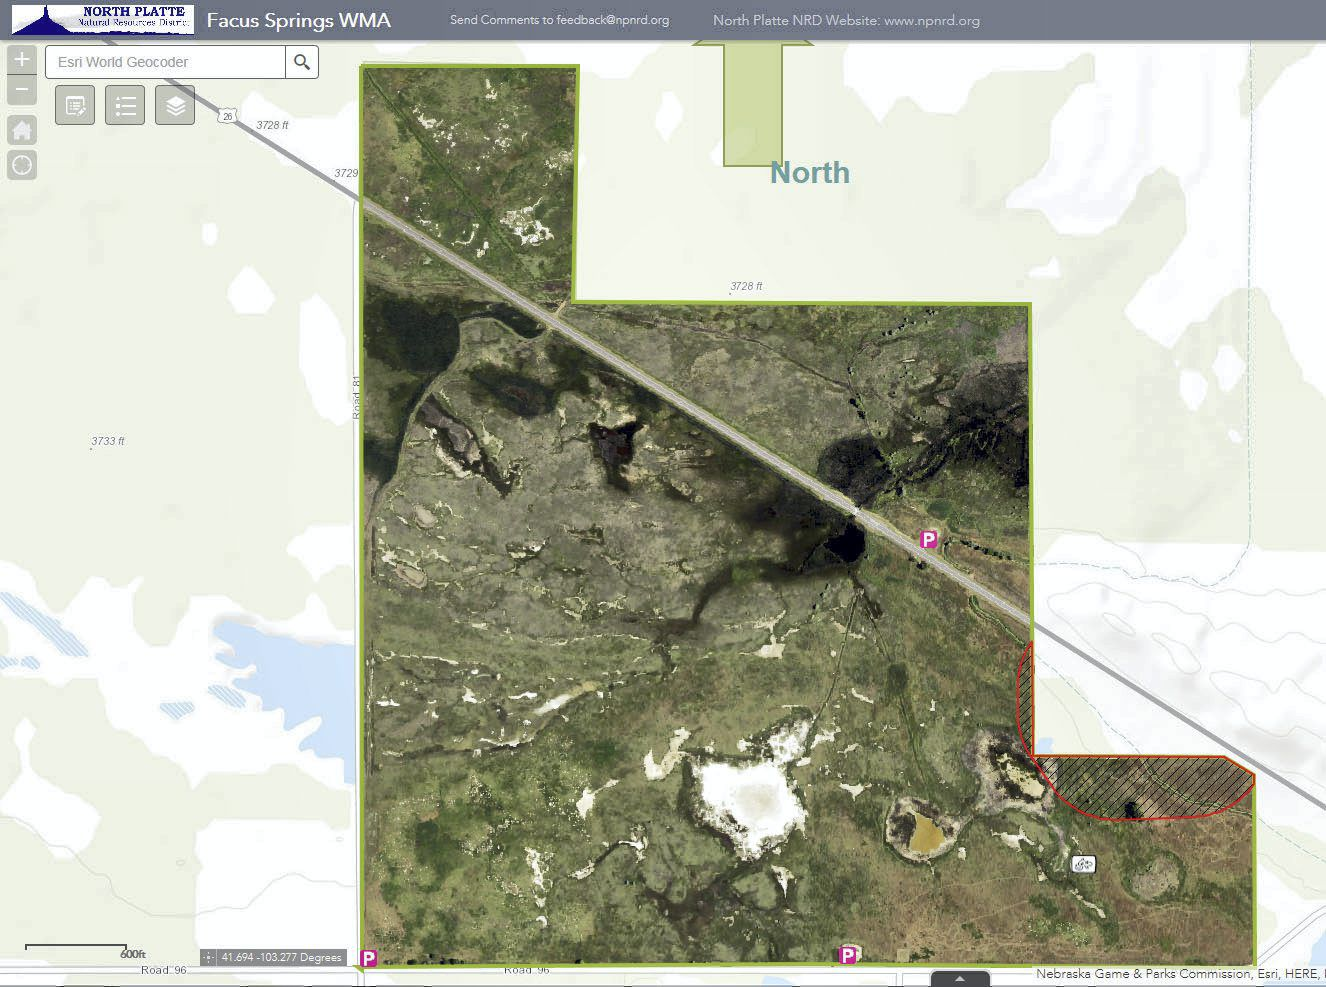 Platte River Basin Environments Faucus Springs